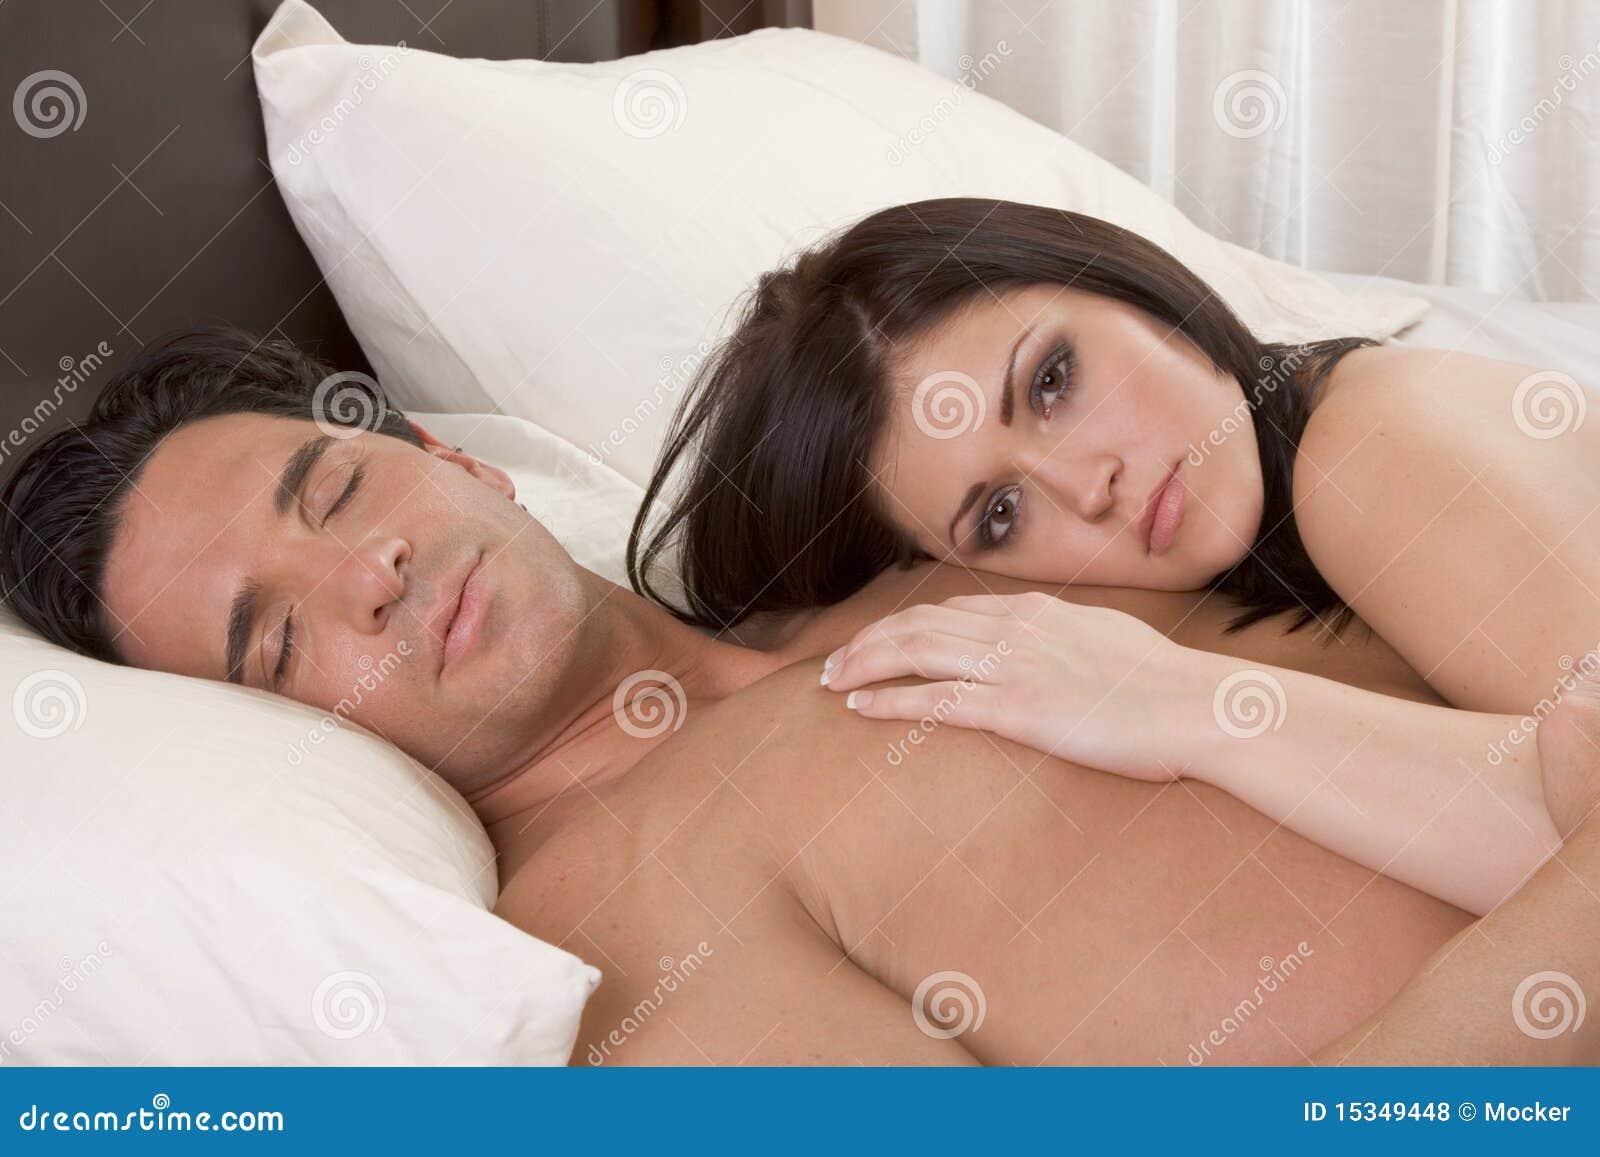 Nackte Junge Paare